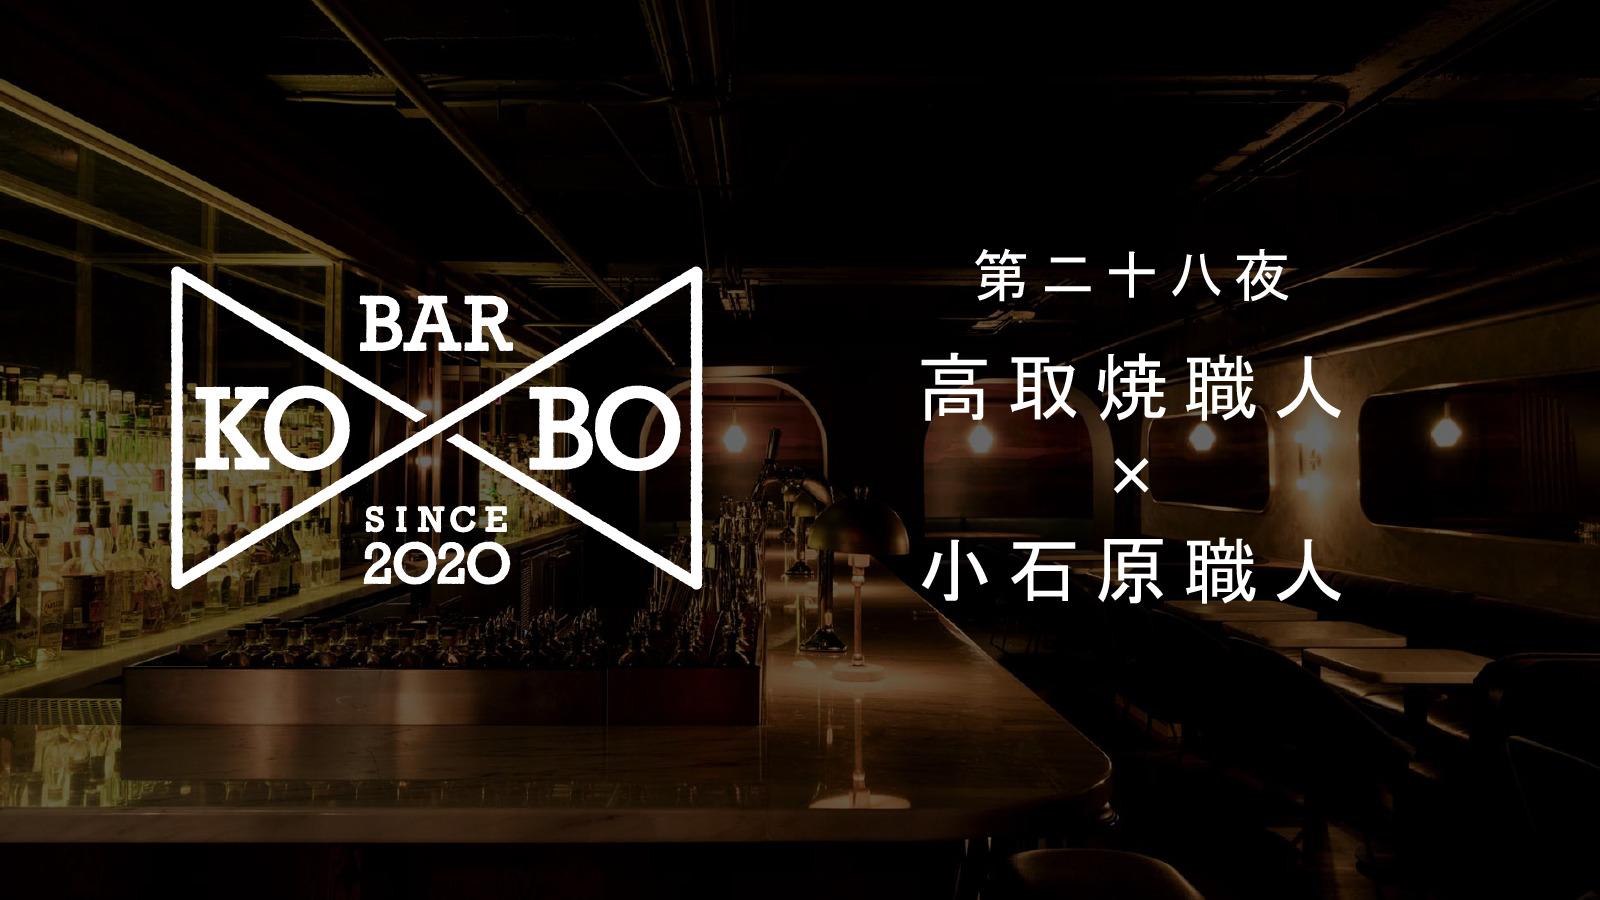 【Bar KO-BO 第二十八夜】高取職人×小石原職人